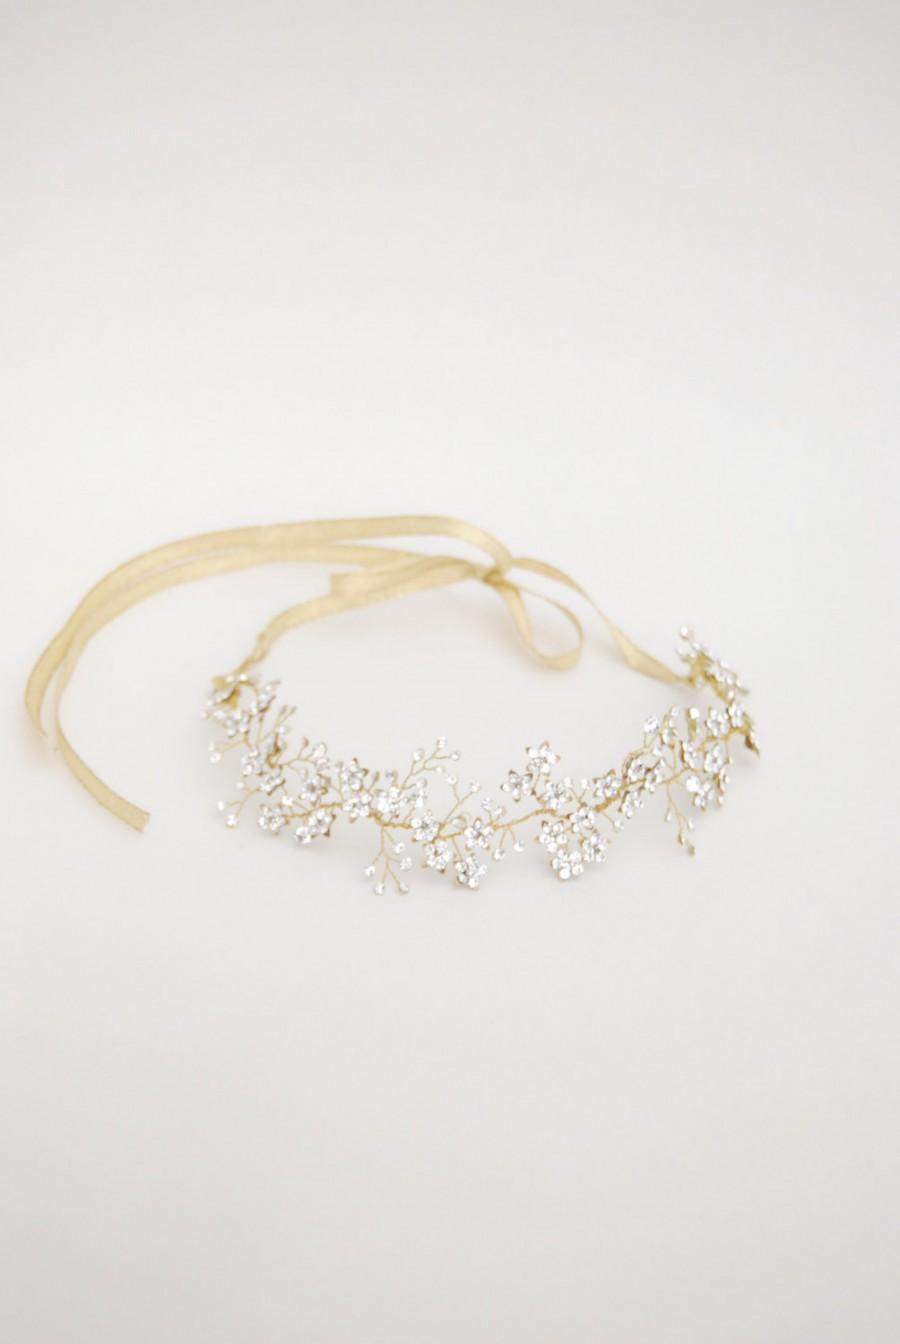 Hochzeit - Bridal hair vine, crystal flower halo, wedding headband, bride forehead band, crystal hair jewel, hair accessories, gold,silver,rose - Anais